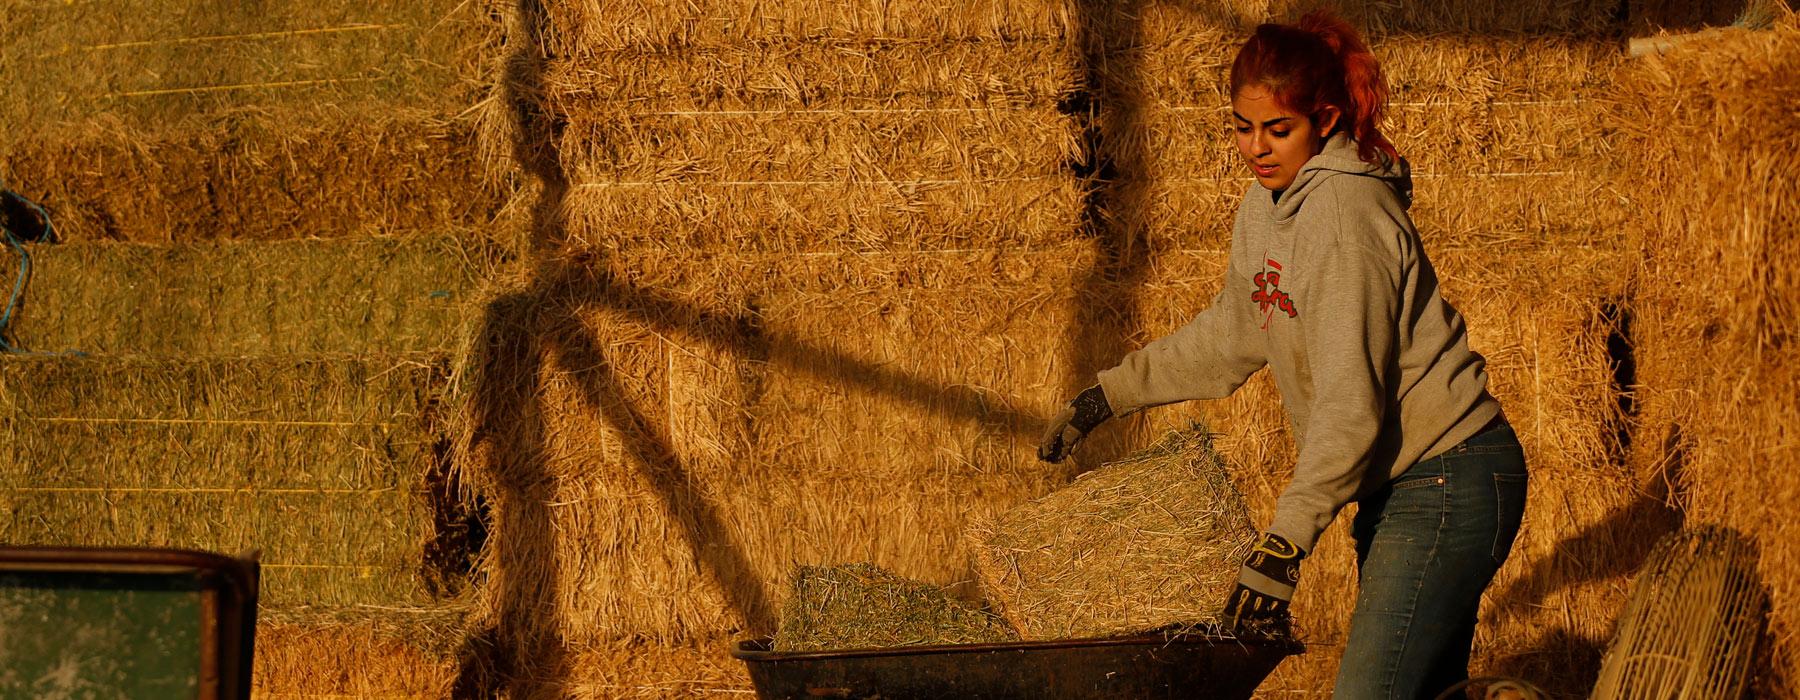 Natalie Gutierrez getting hay